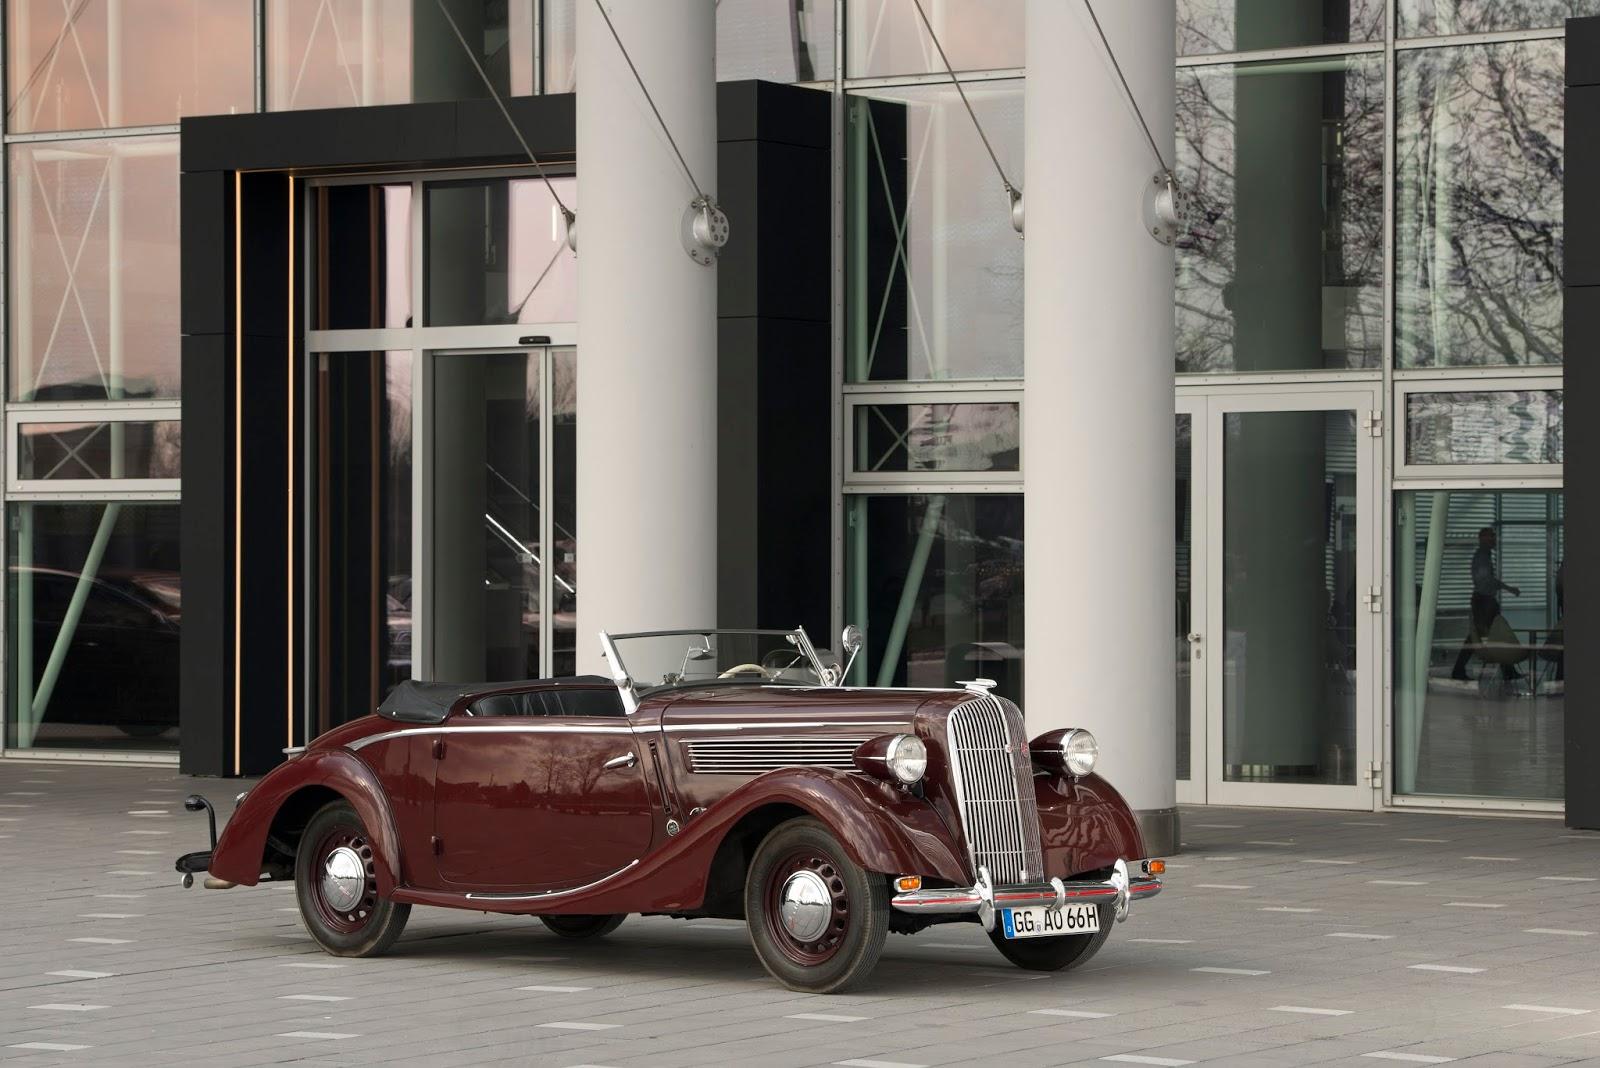 Opel Rallye Hessen Th25C325BCringen 301766 H Πλούσια Κληρονομιά των Opel Cabrio cabrio, Opel, Opel 8/25 hp, Opel Cascada, Opel Olympia, Opel Record, Opel Super 6